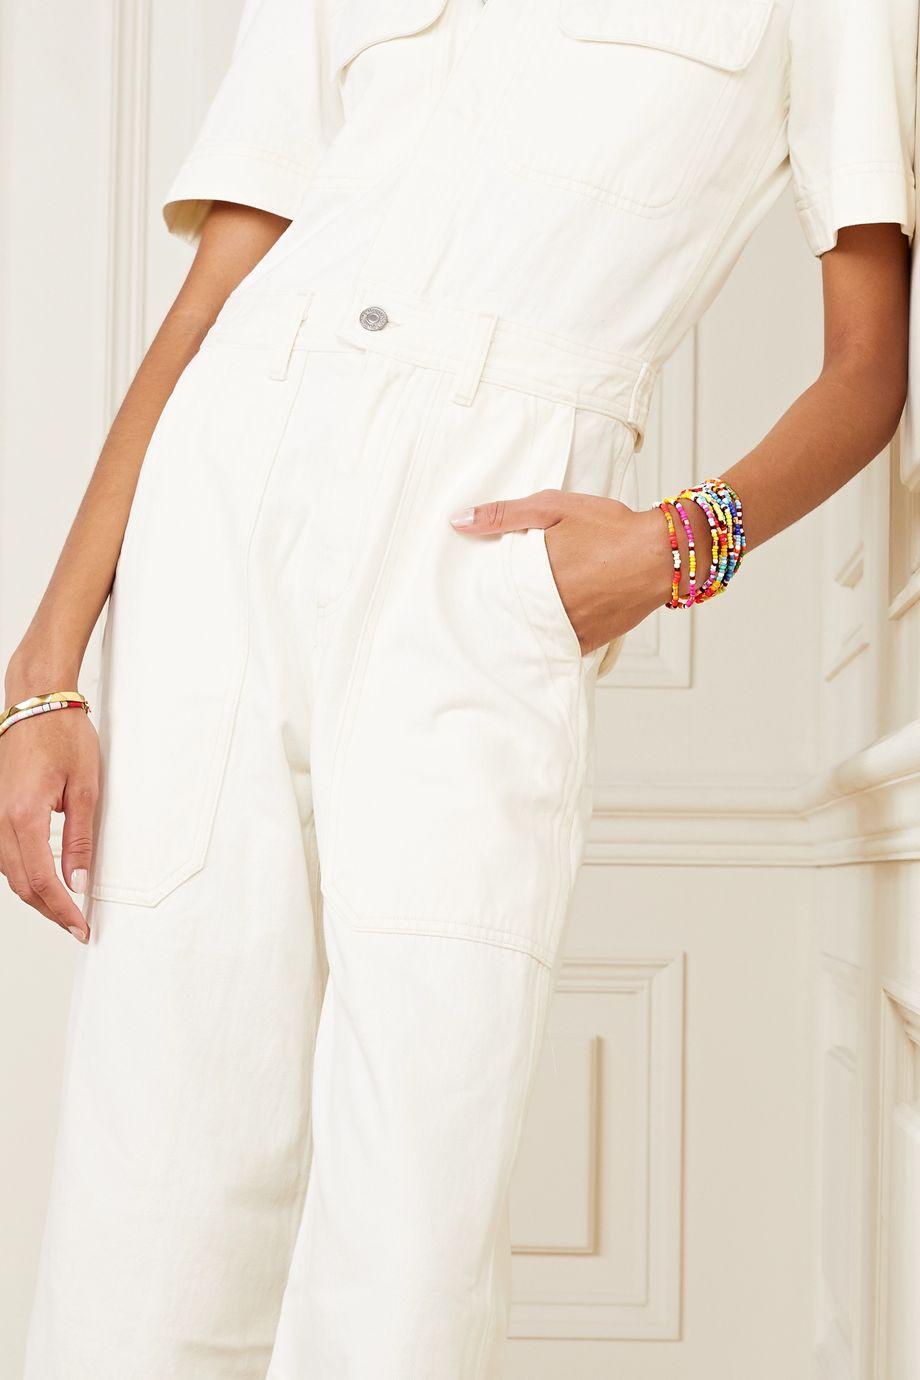 Roxanne Assoulin New Patchwork 珠饰手链(12 条装)